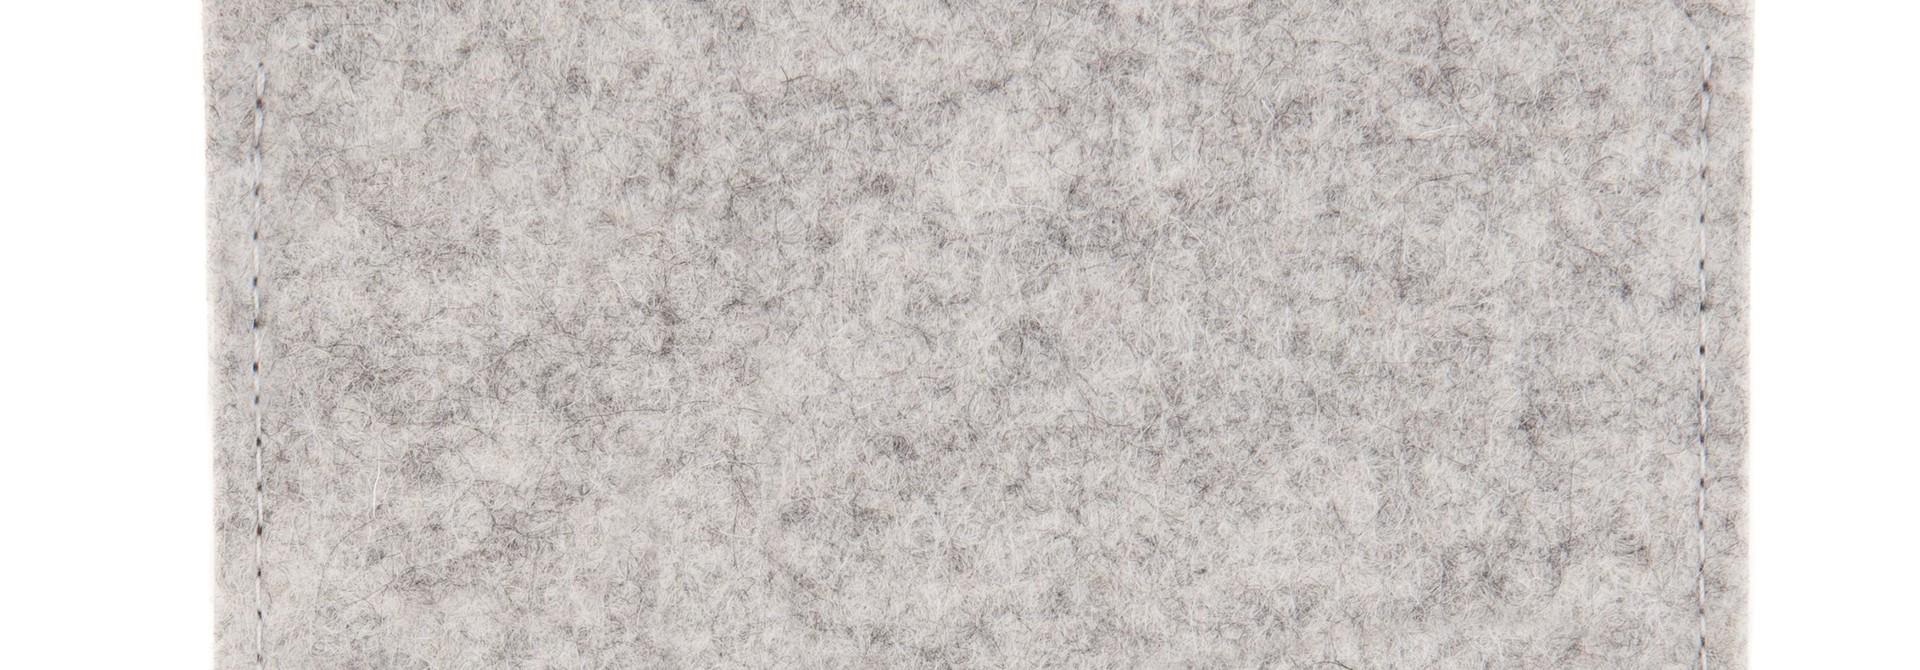 AirPods Sleeve Light-Grey